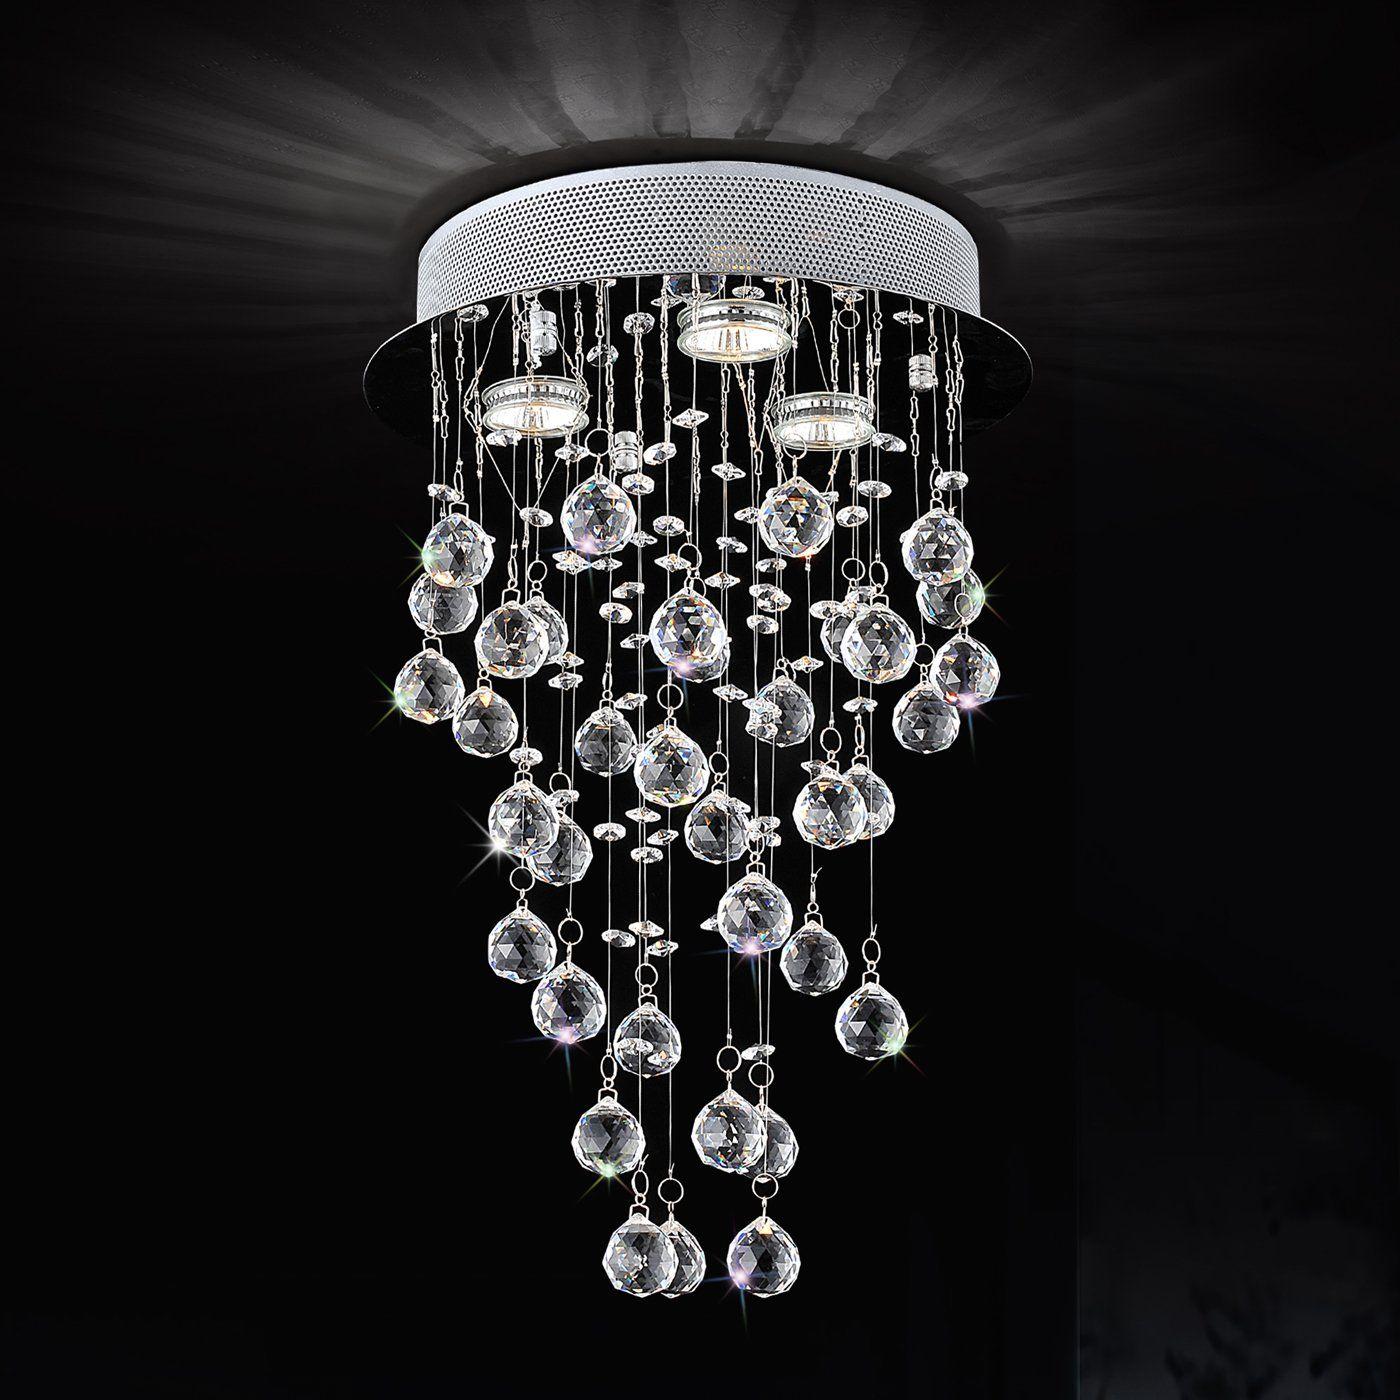 Shop Crystal World Lighting 96840-3 3 Light Rain Drop Large Pendant at Loweu0027s Canada & Shop Crystal World Lighting 96840-3 3 Light Rain Drop Large ... azcodes.com